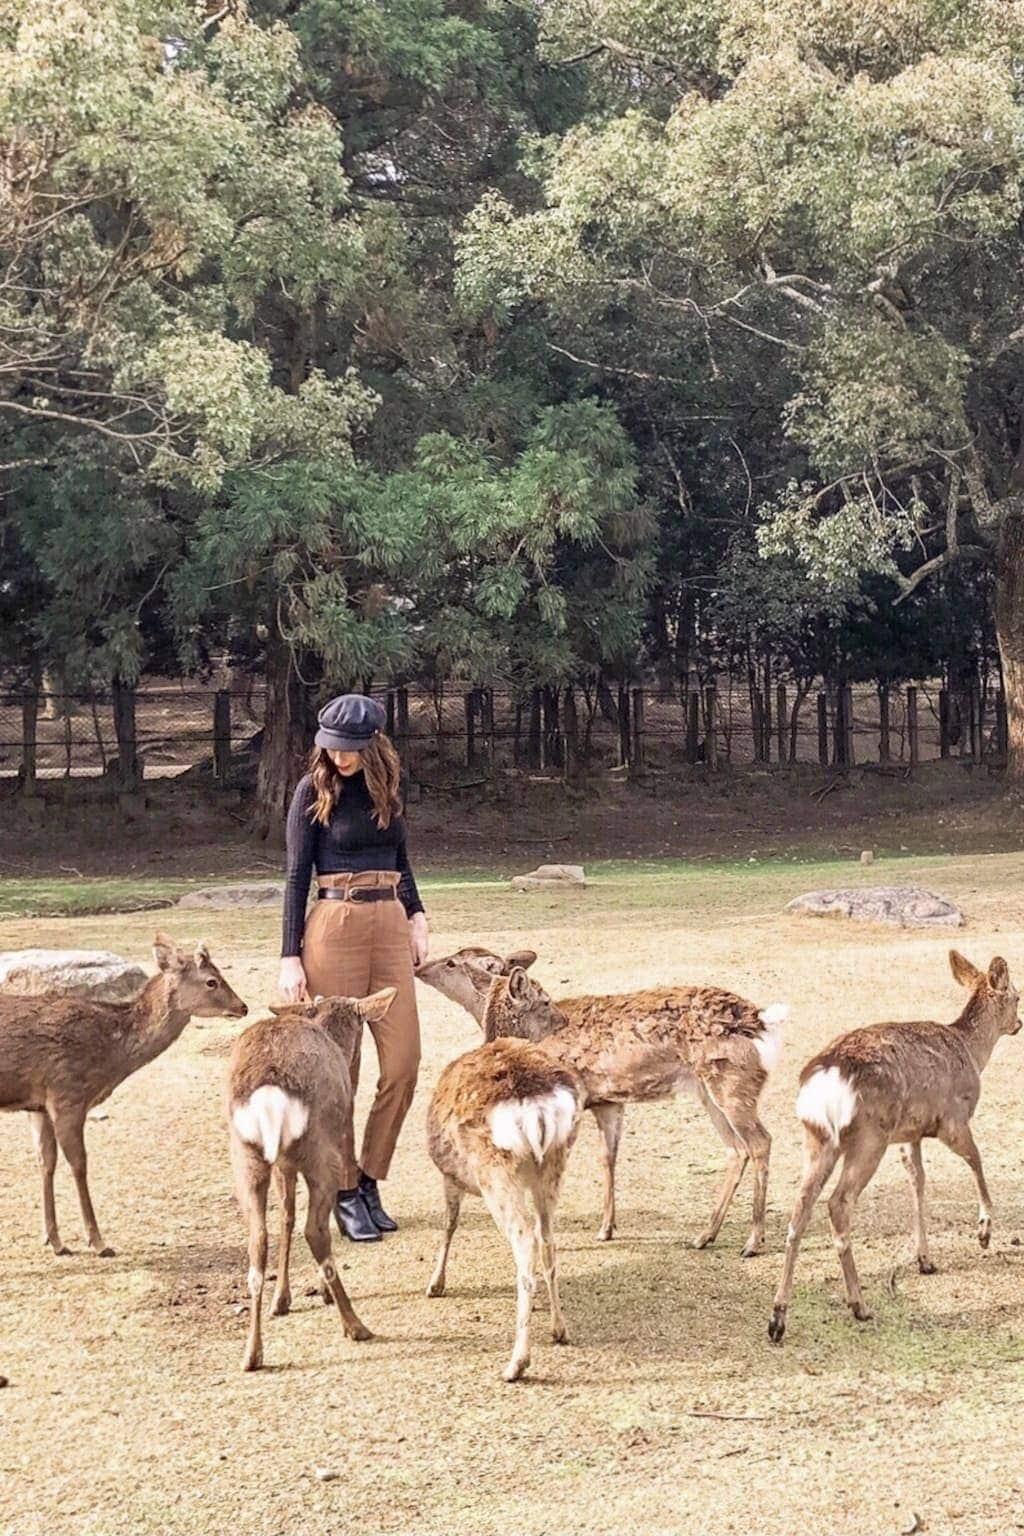 Feeding deer on a day trip to Nara, Japan